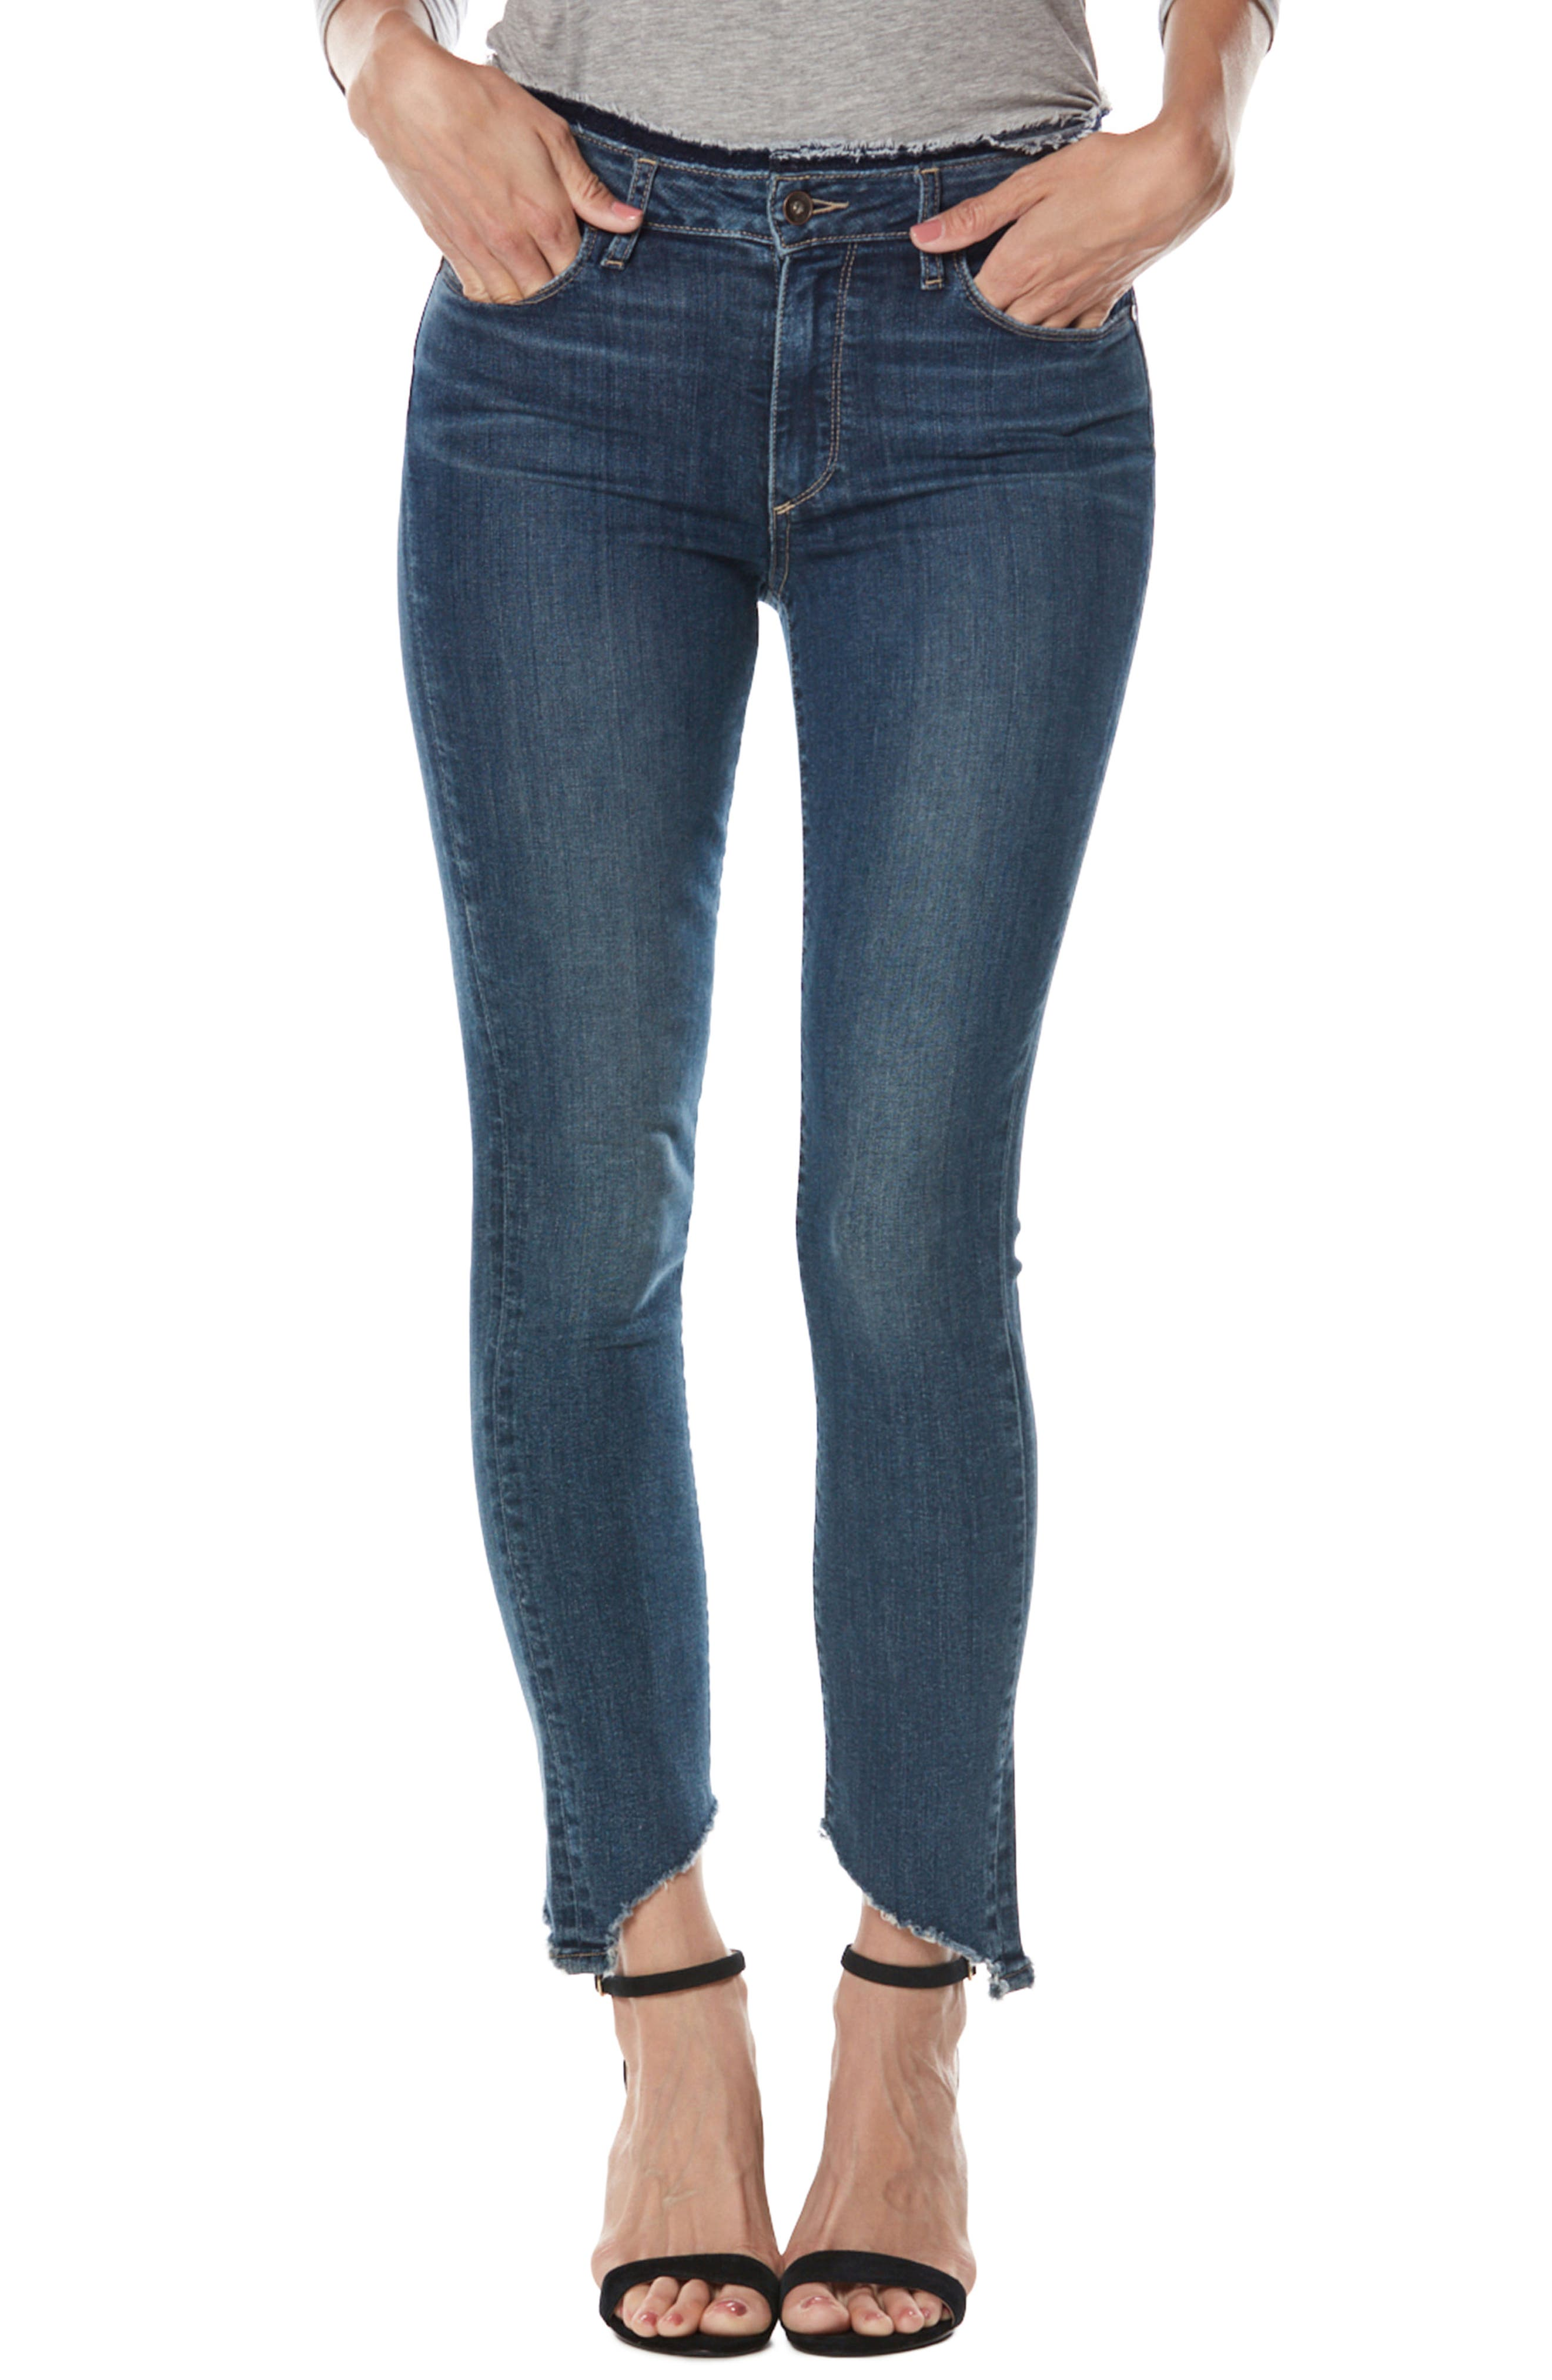 PAIGE Hoxton High Waist Frayed Hem Ankle Skinny Jeans